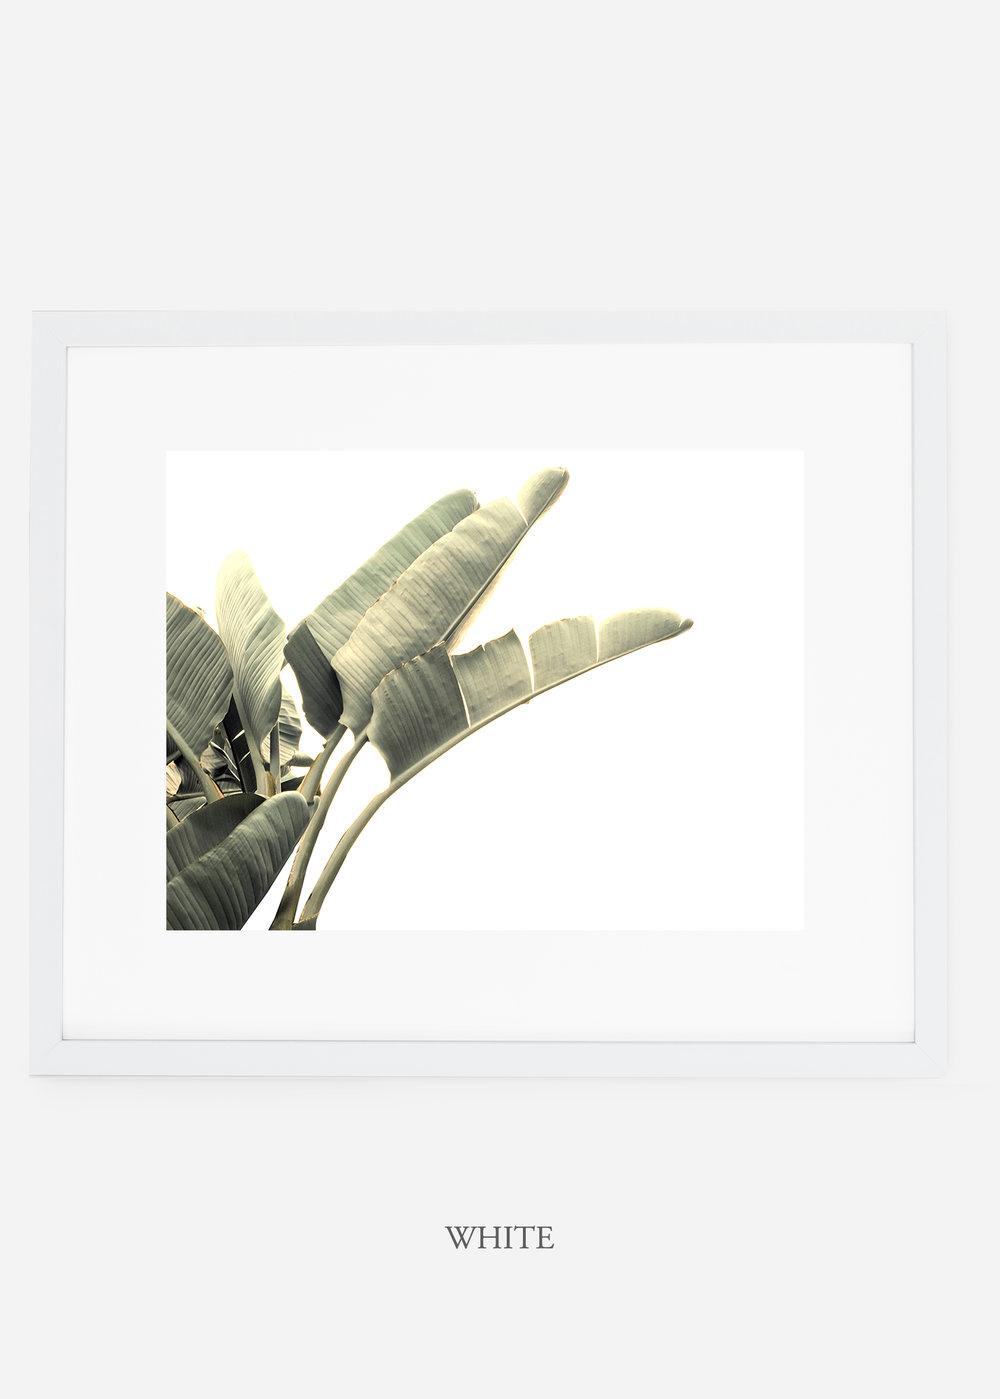 WilderCalifornia_interiordesign_art_whiteframe_RainforestNo.1_Mat.jpg